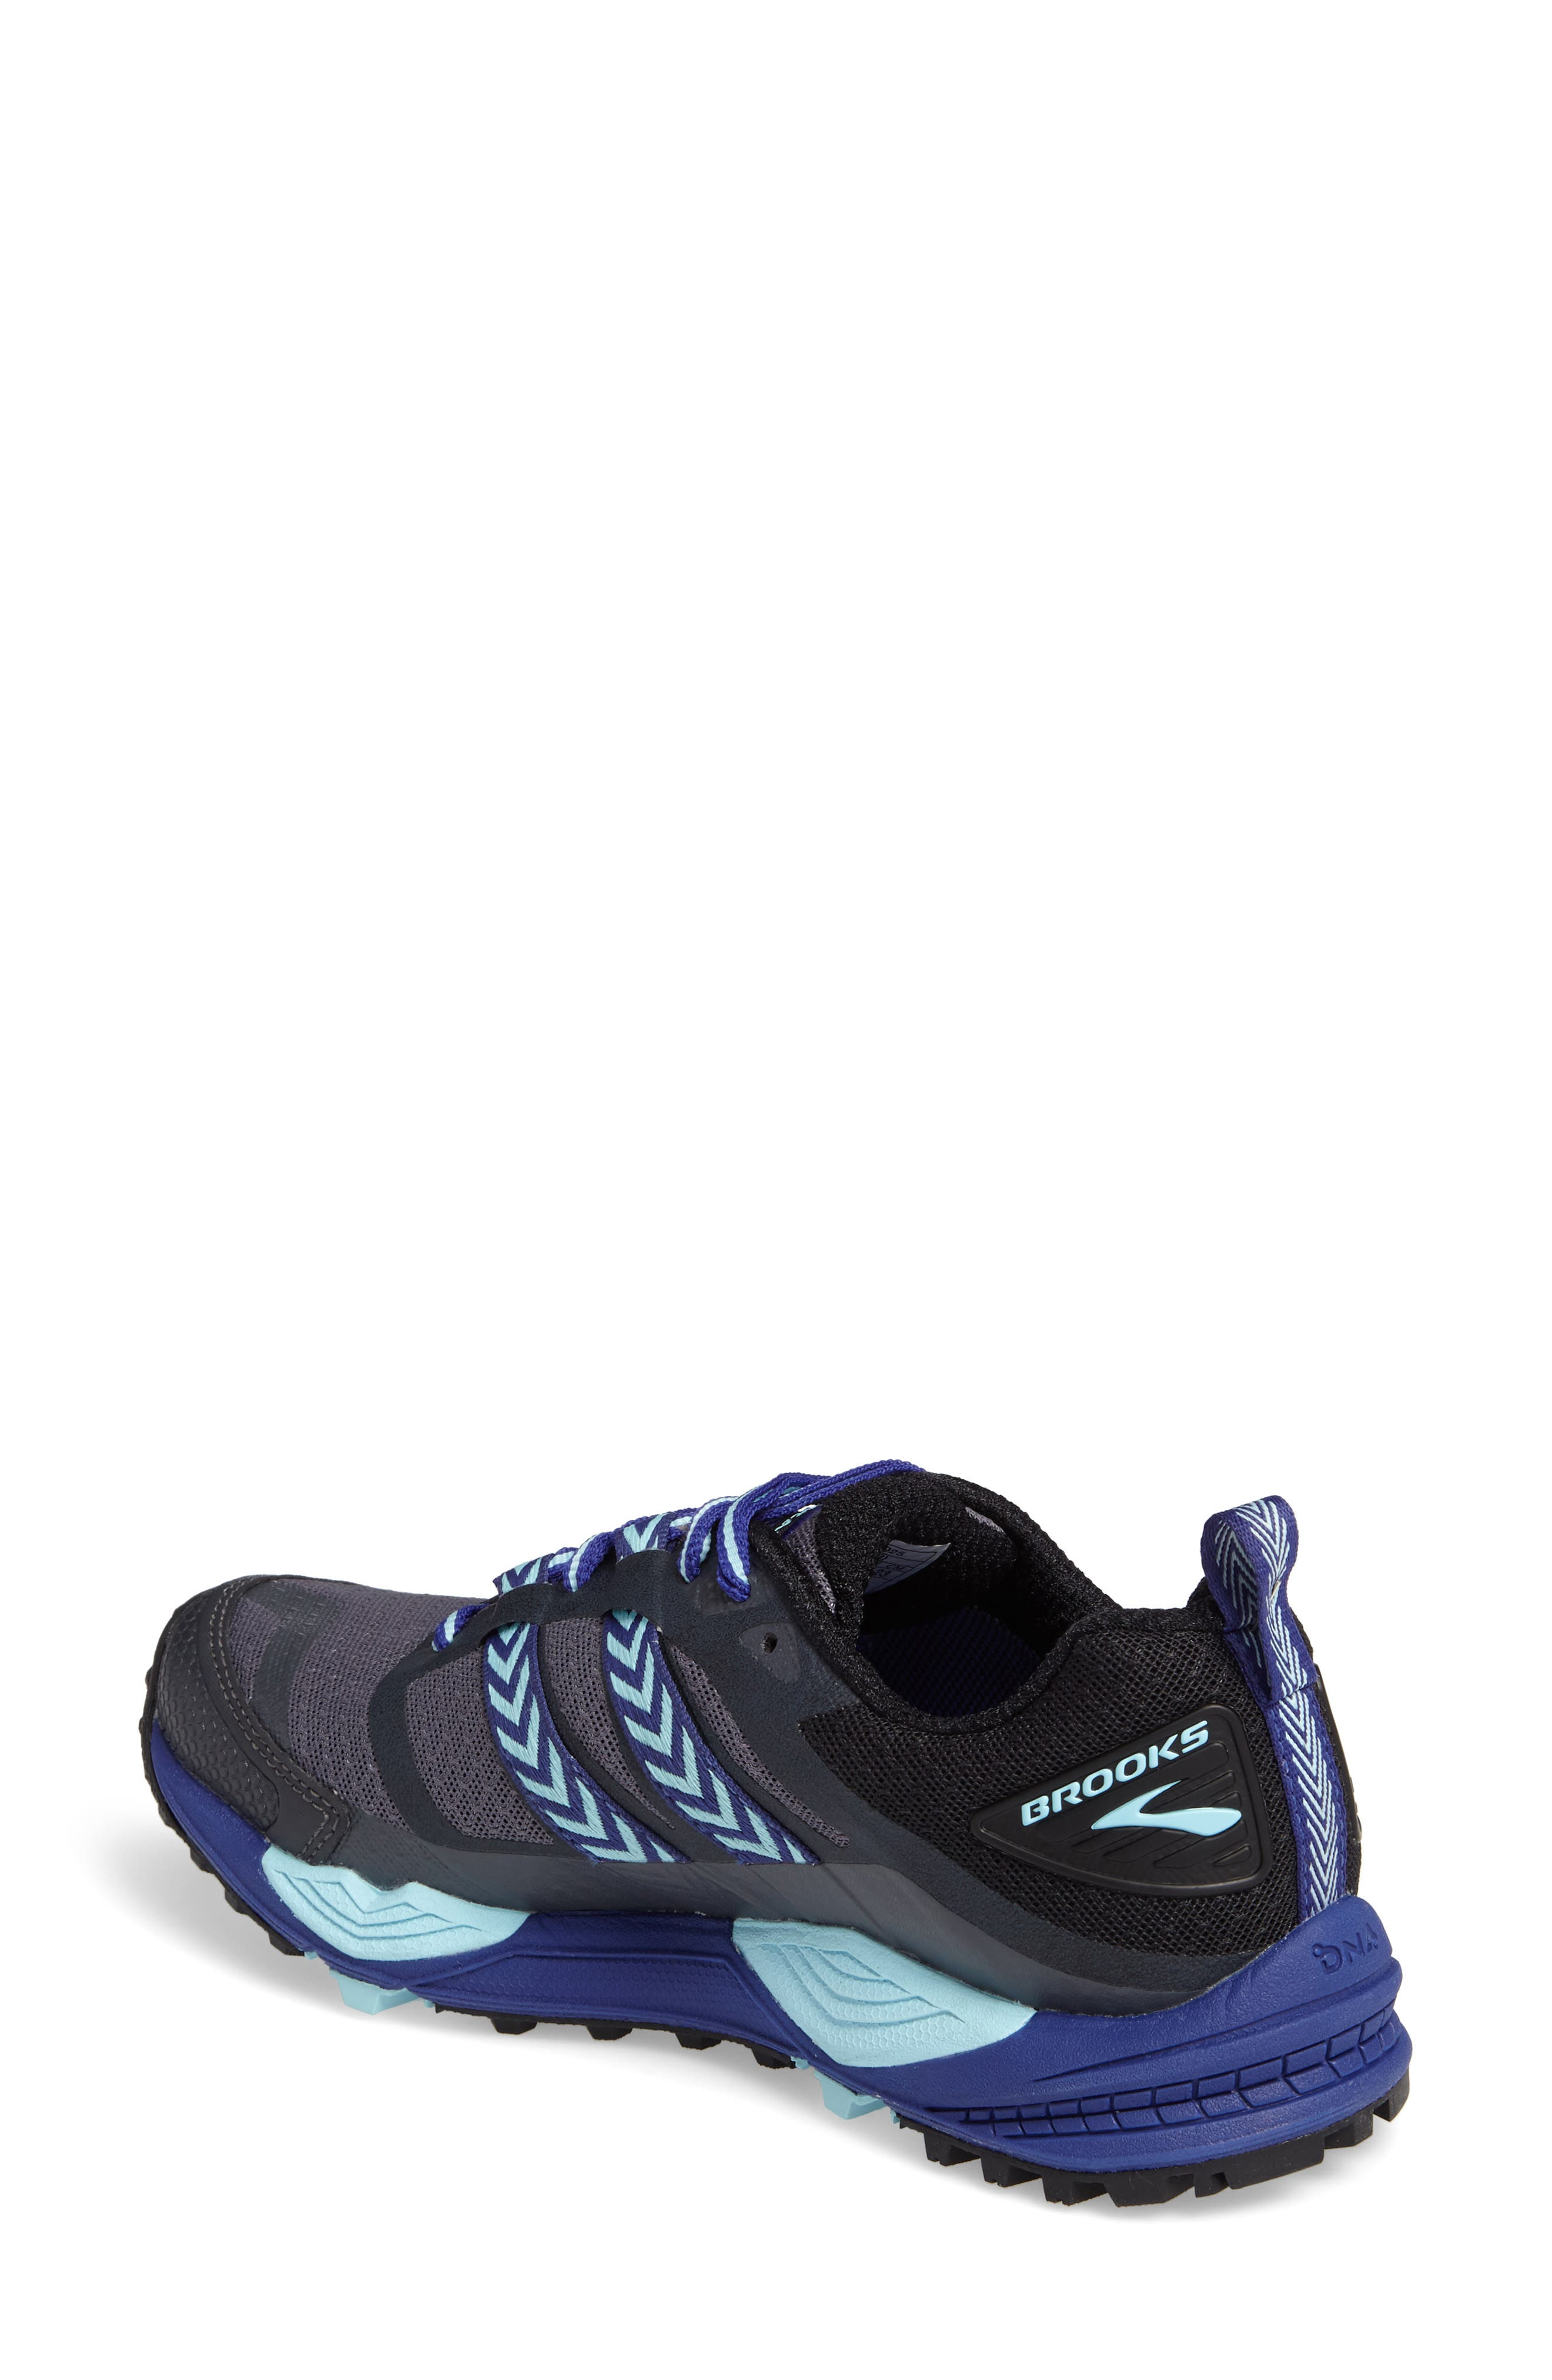 Cascadia 12 GTX Trail Running Shoe,                             Alternate thumbnail 2, color,                             Black/ Ebony/ Clematis Blue